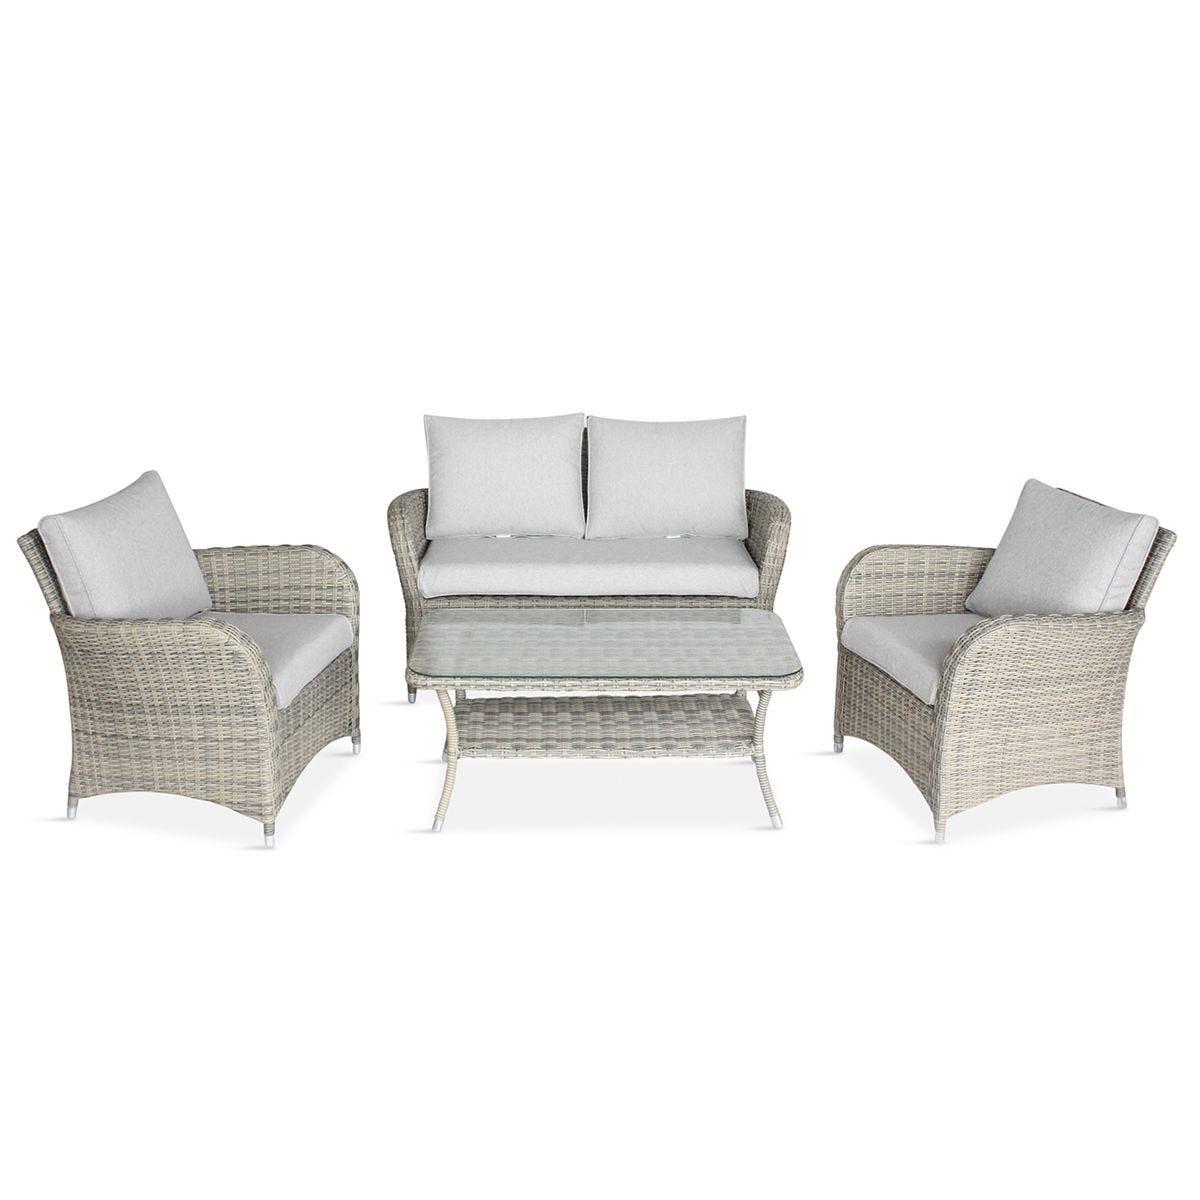 LG Outdoor Monaco Hazel Lounge Set